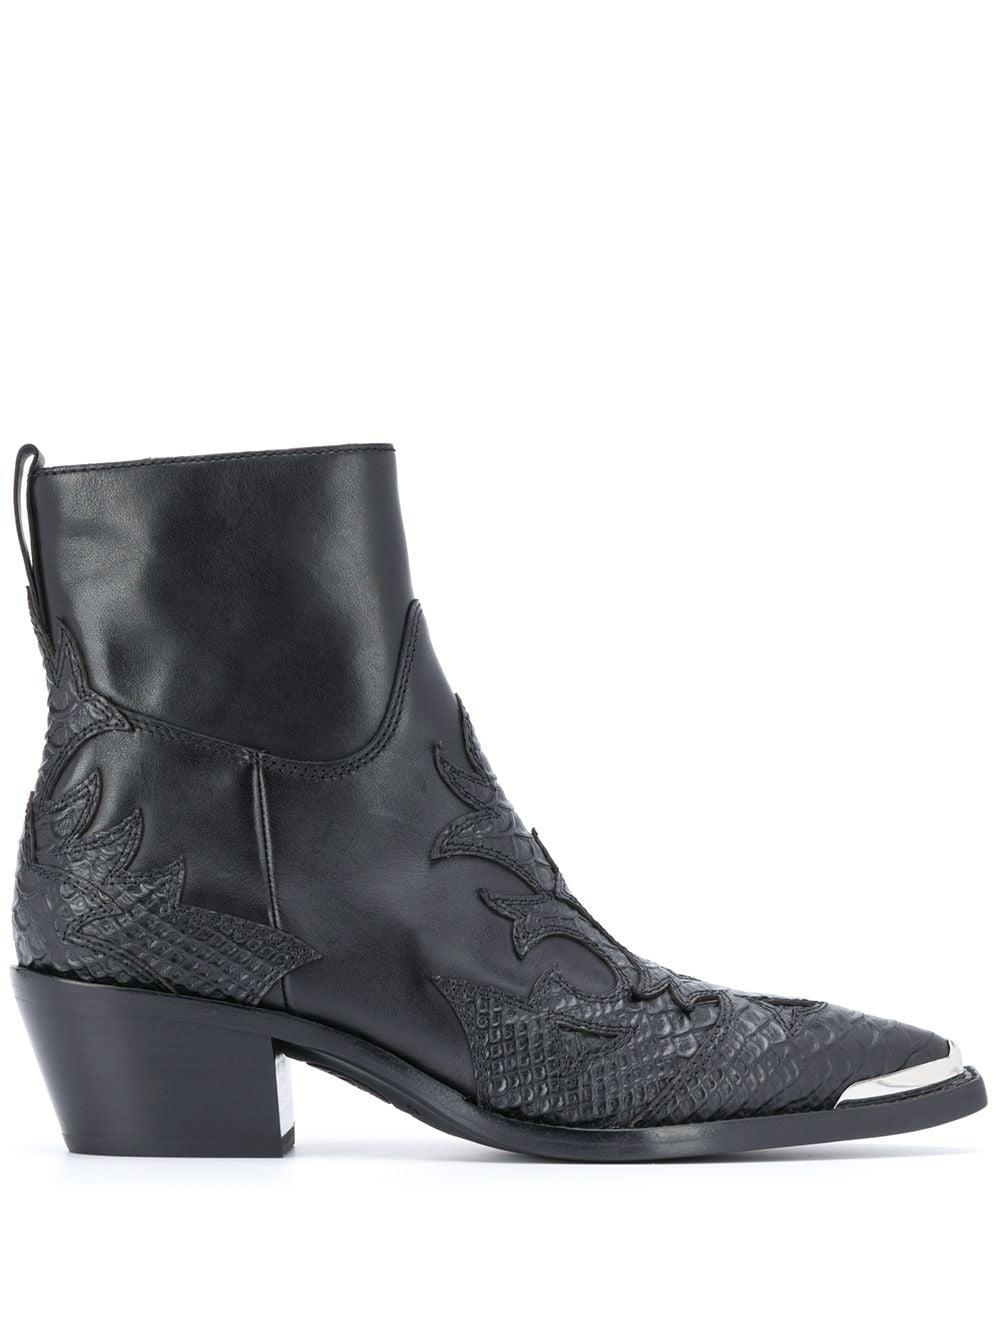 Django Ankle Boots